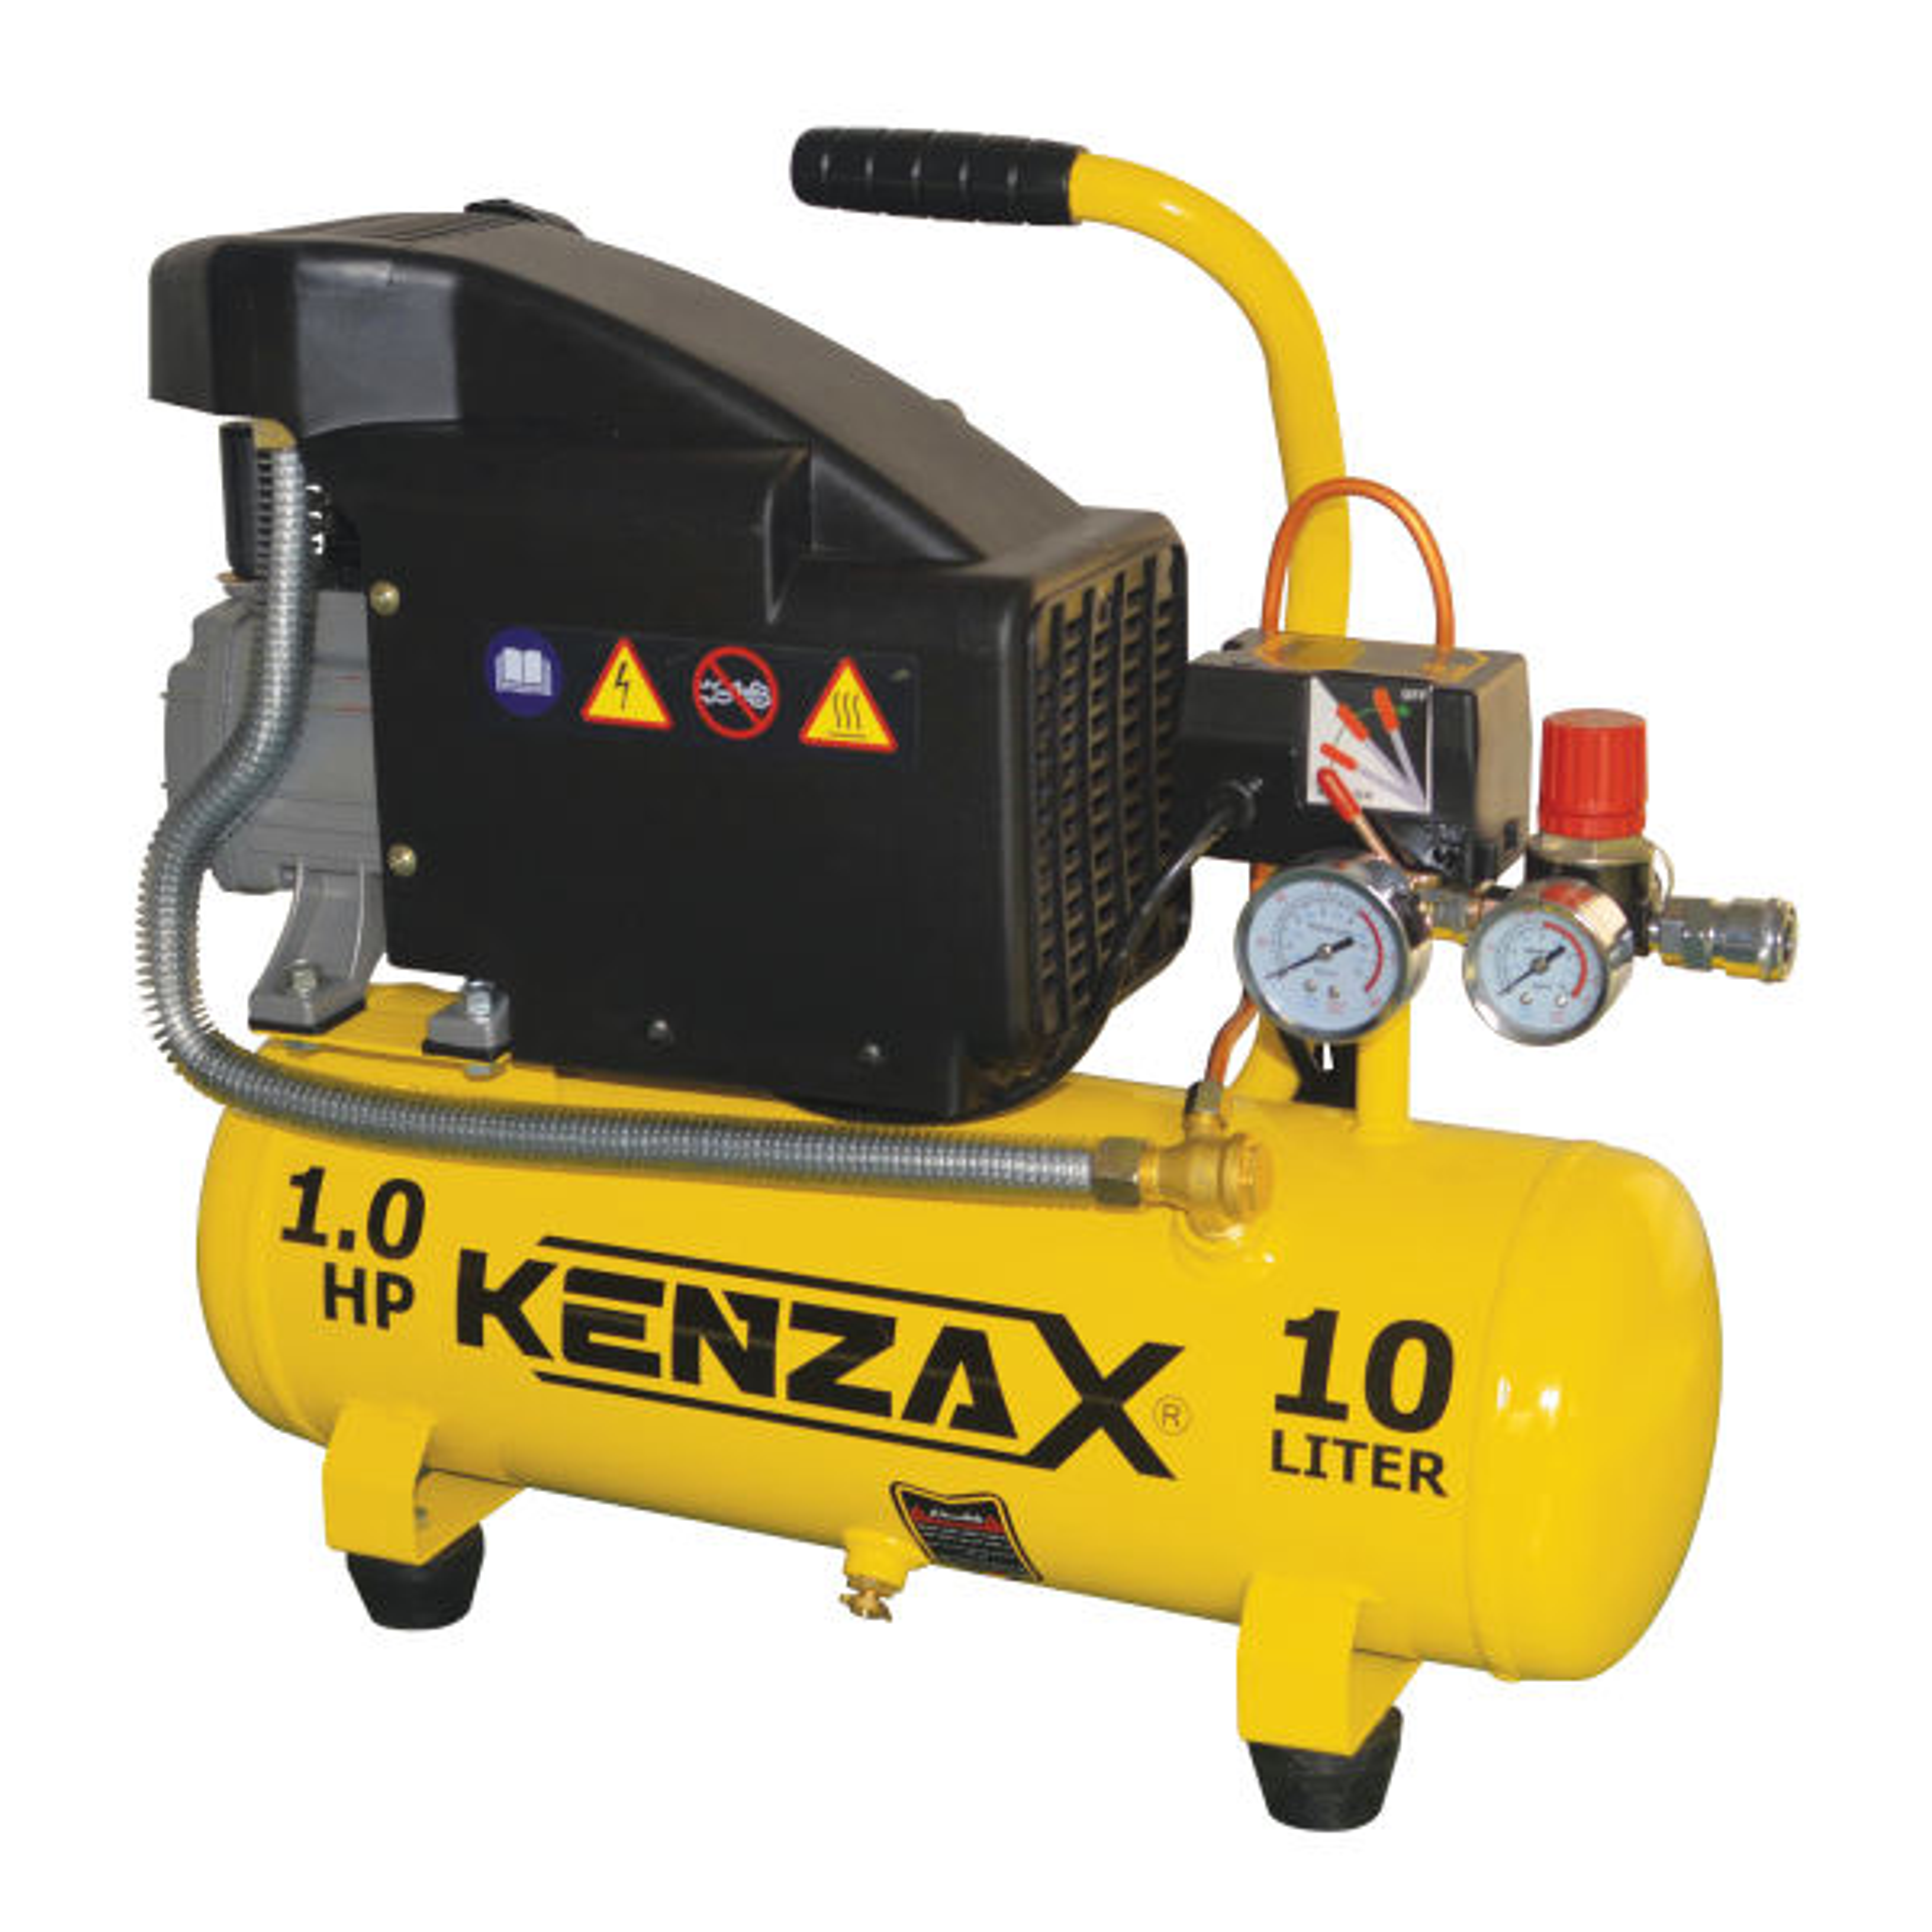 کمپرسور باد کنزاکس مدل KAC-110